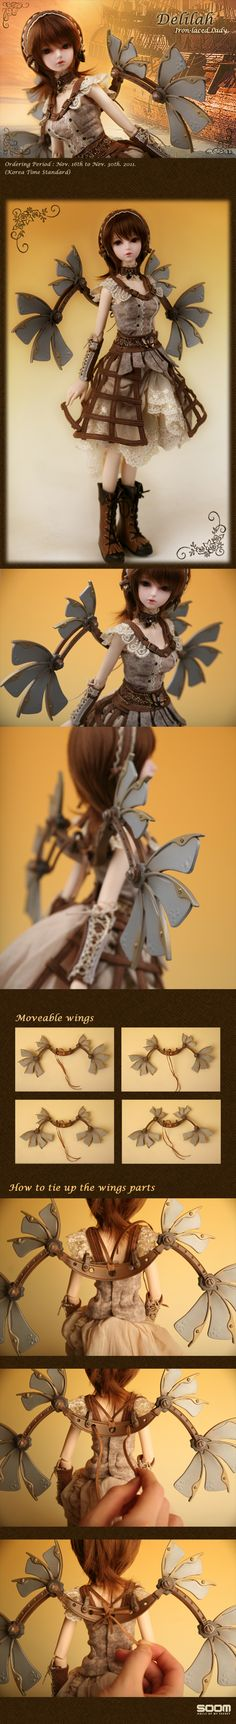 Product View : Rosette School - [Steam Rosette]Delilah wings #Steampunk